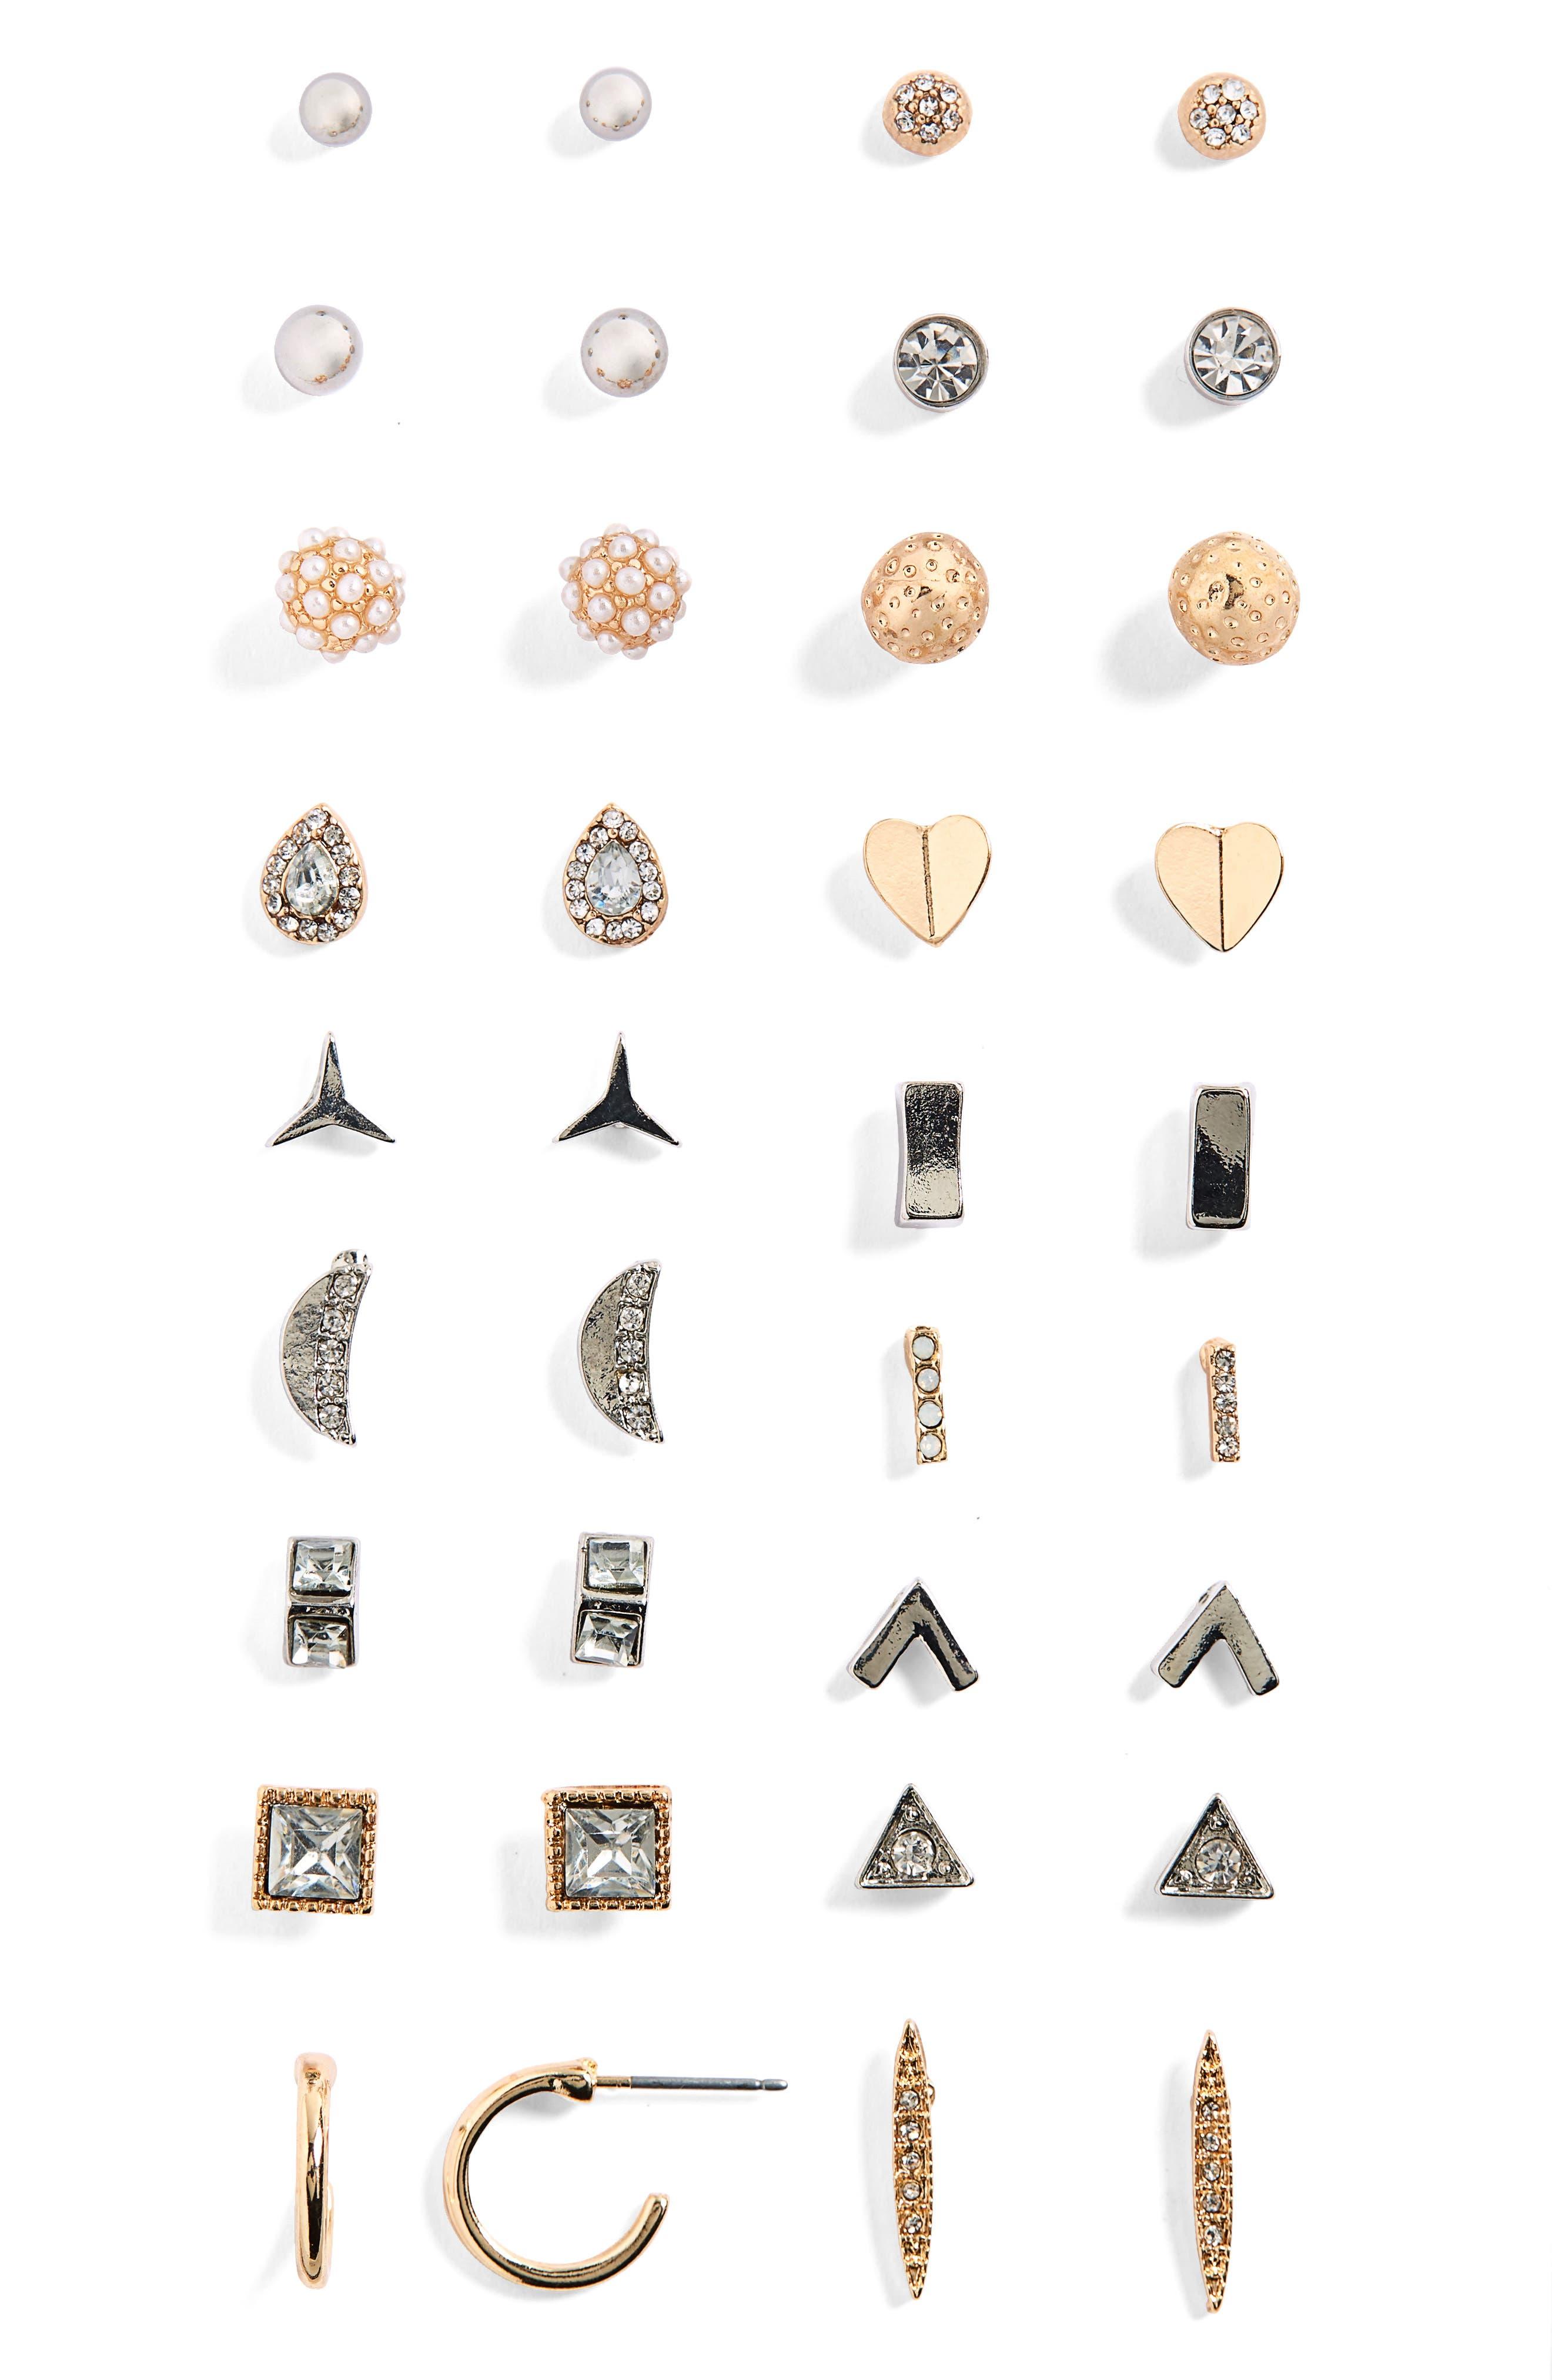 18-Pack Imitation Pearl & Crystal Stud Earrings,                             Main thumbnail 1, color,